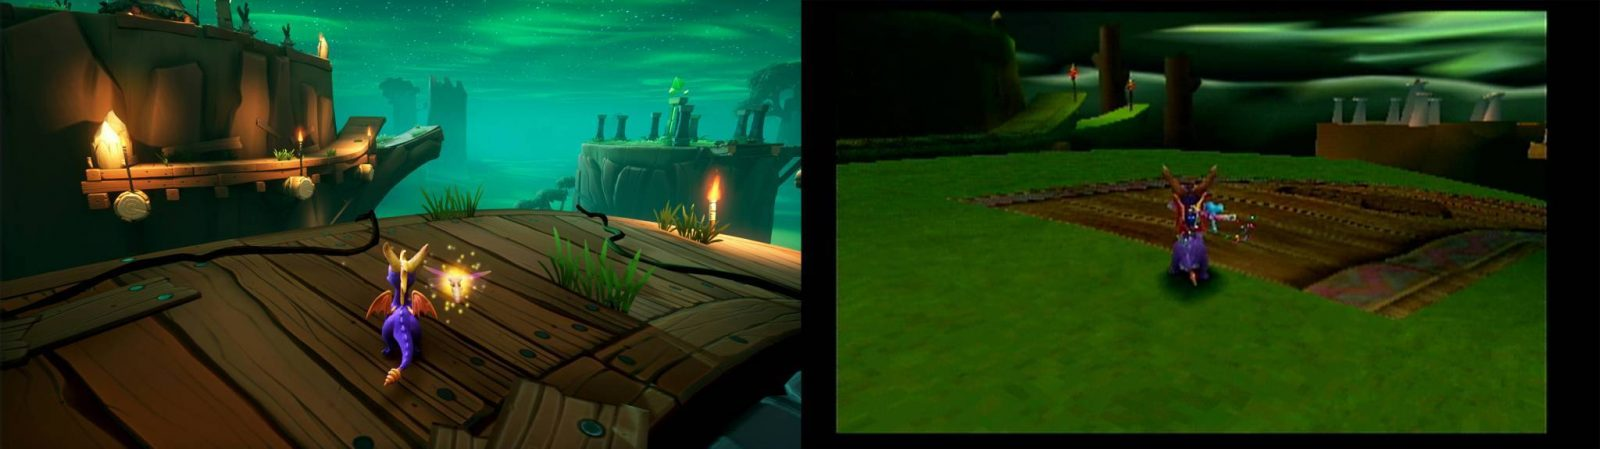 Spyro-Reignited-Trilogy-islademonos-5